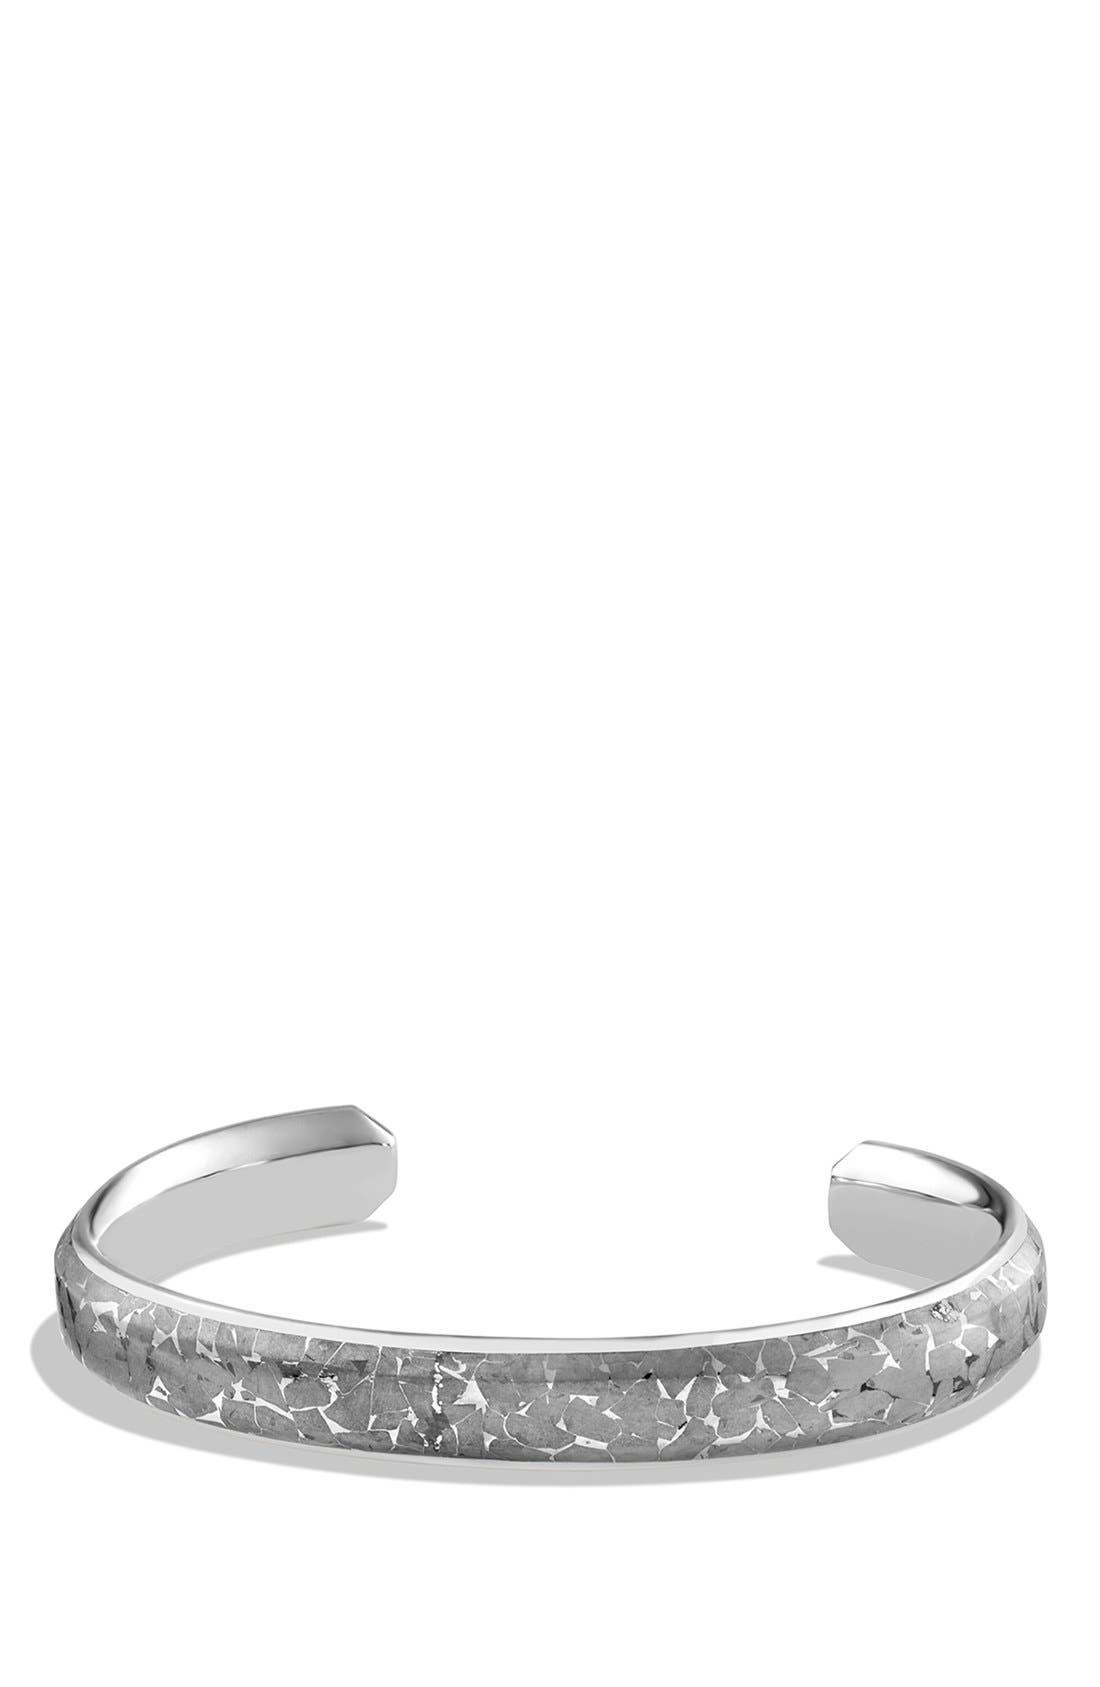 David Yurman 'Meteorite' Fused Cuff Bracelet